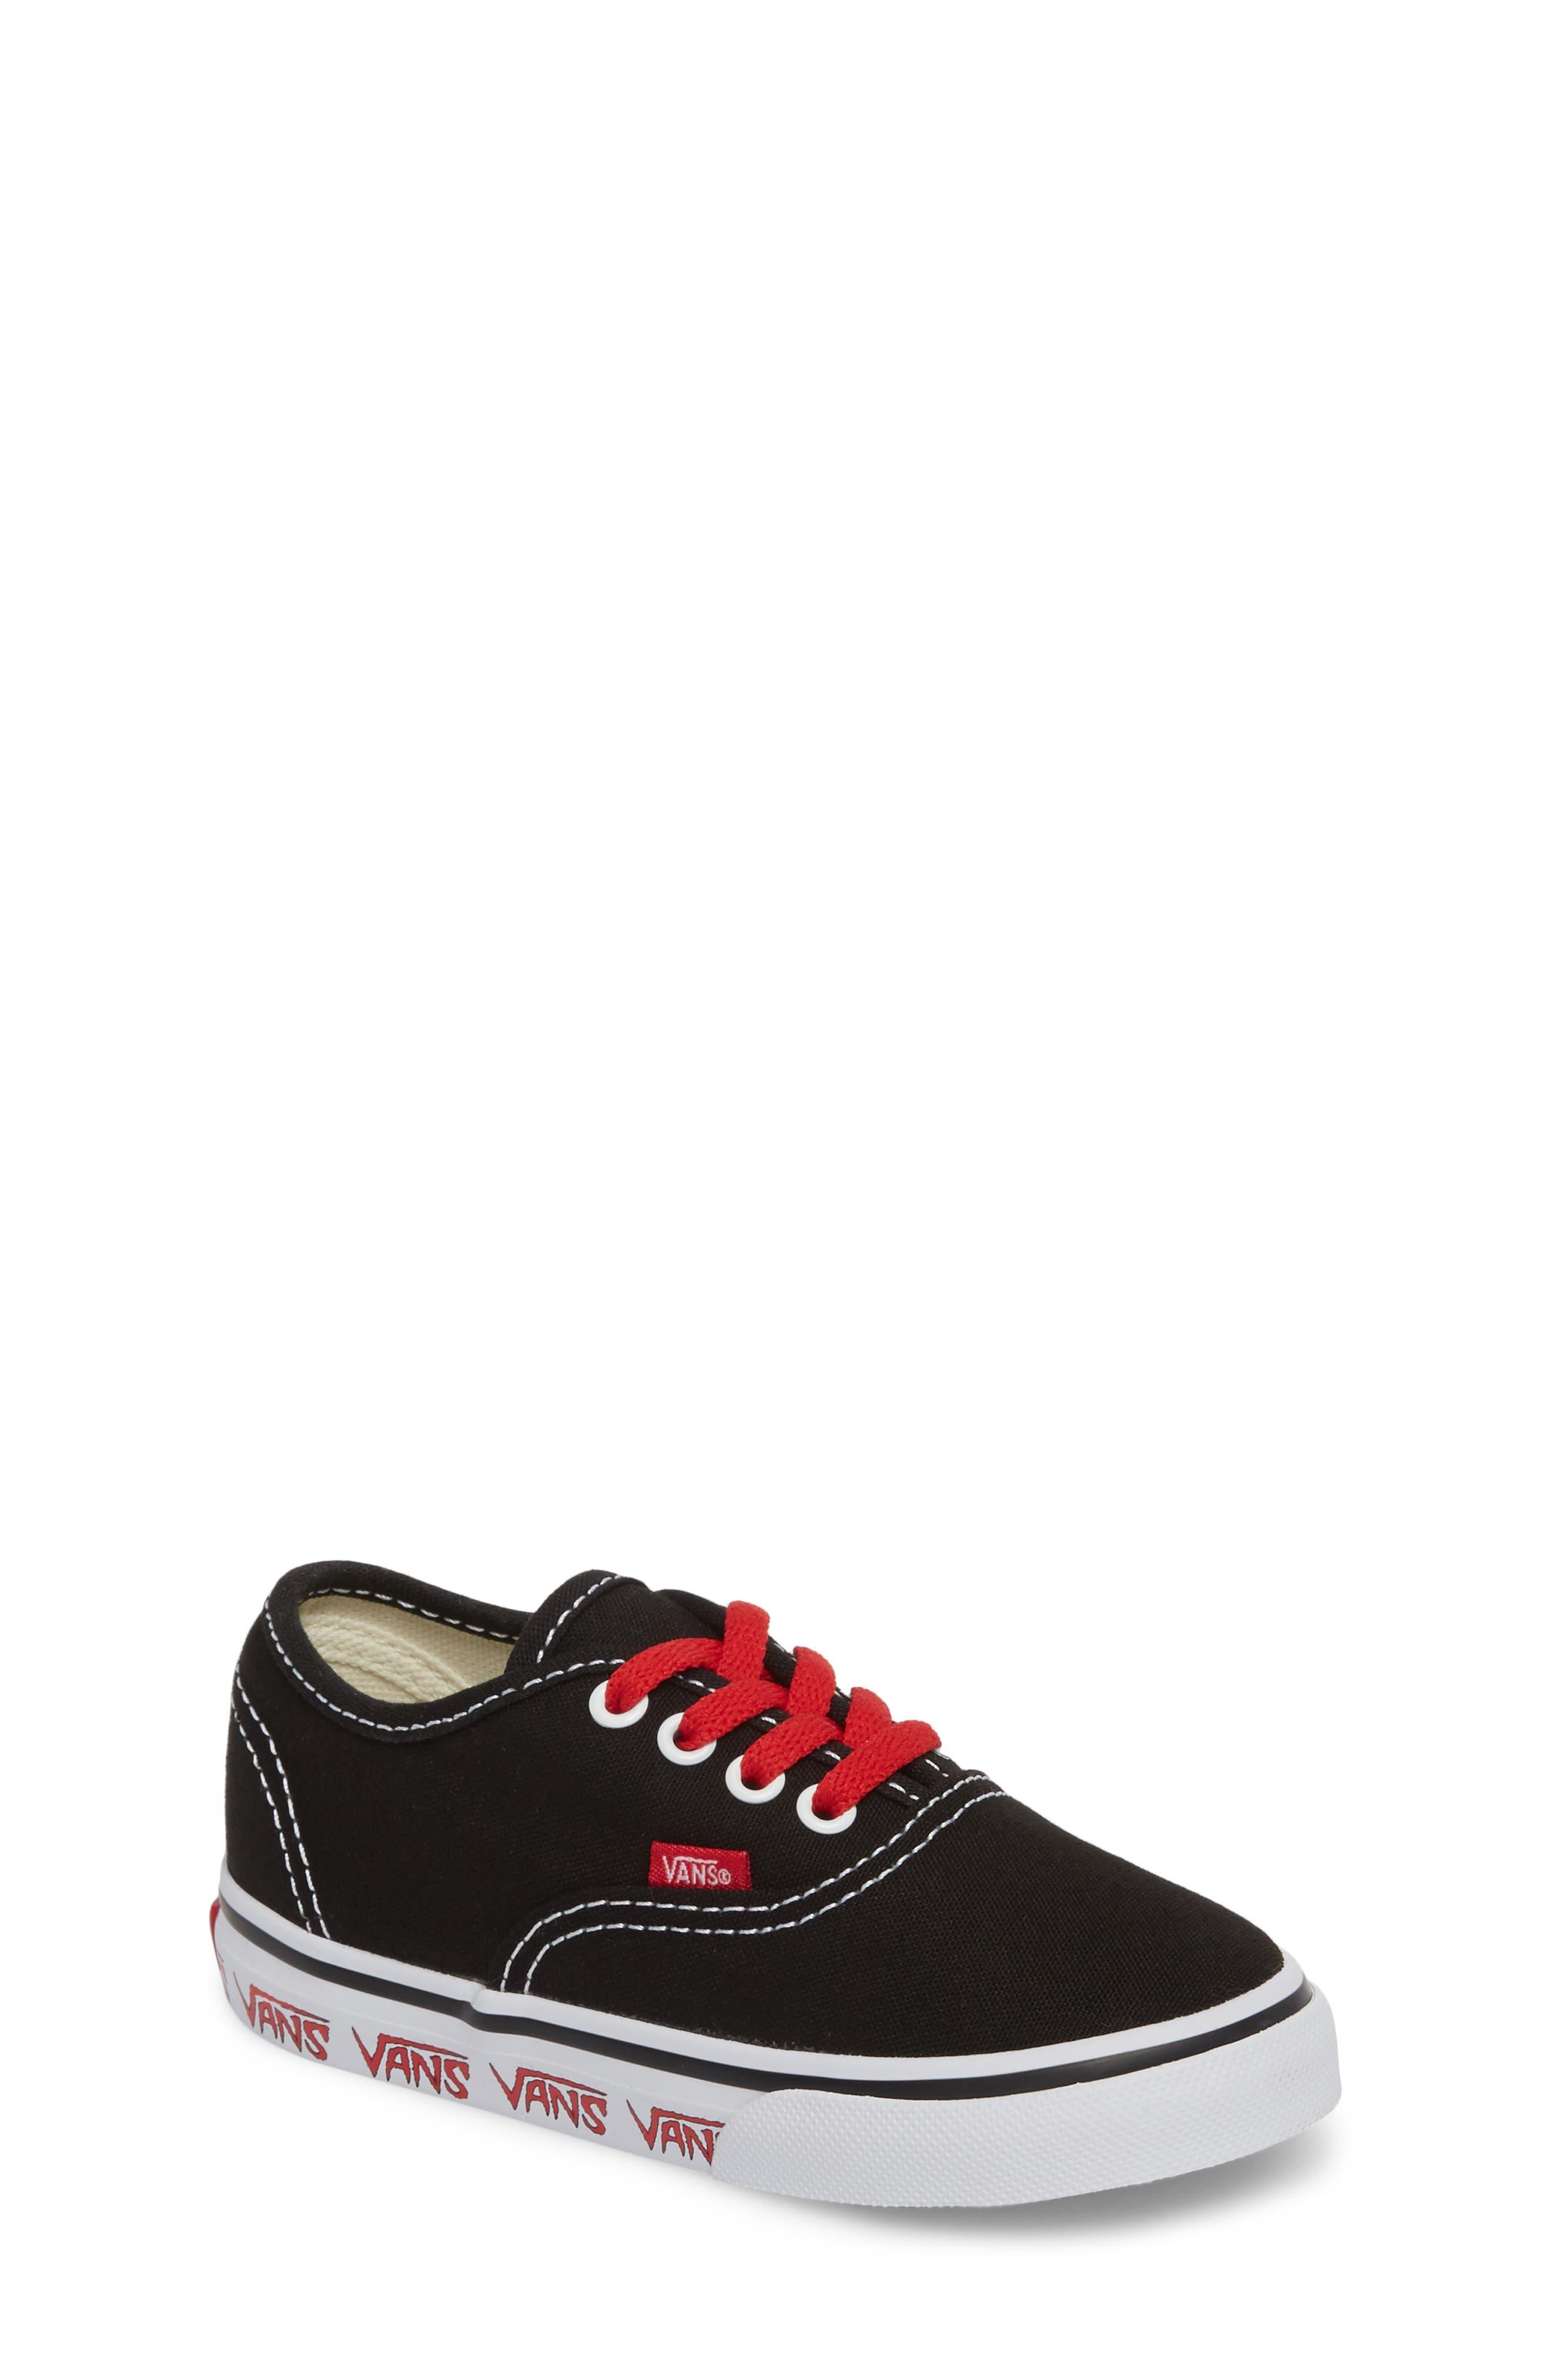 Vans Authentic Sketch Sneaker (Baby, Walker, Toddler, Little Kid & Big Kid)